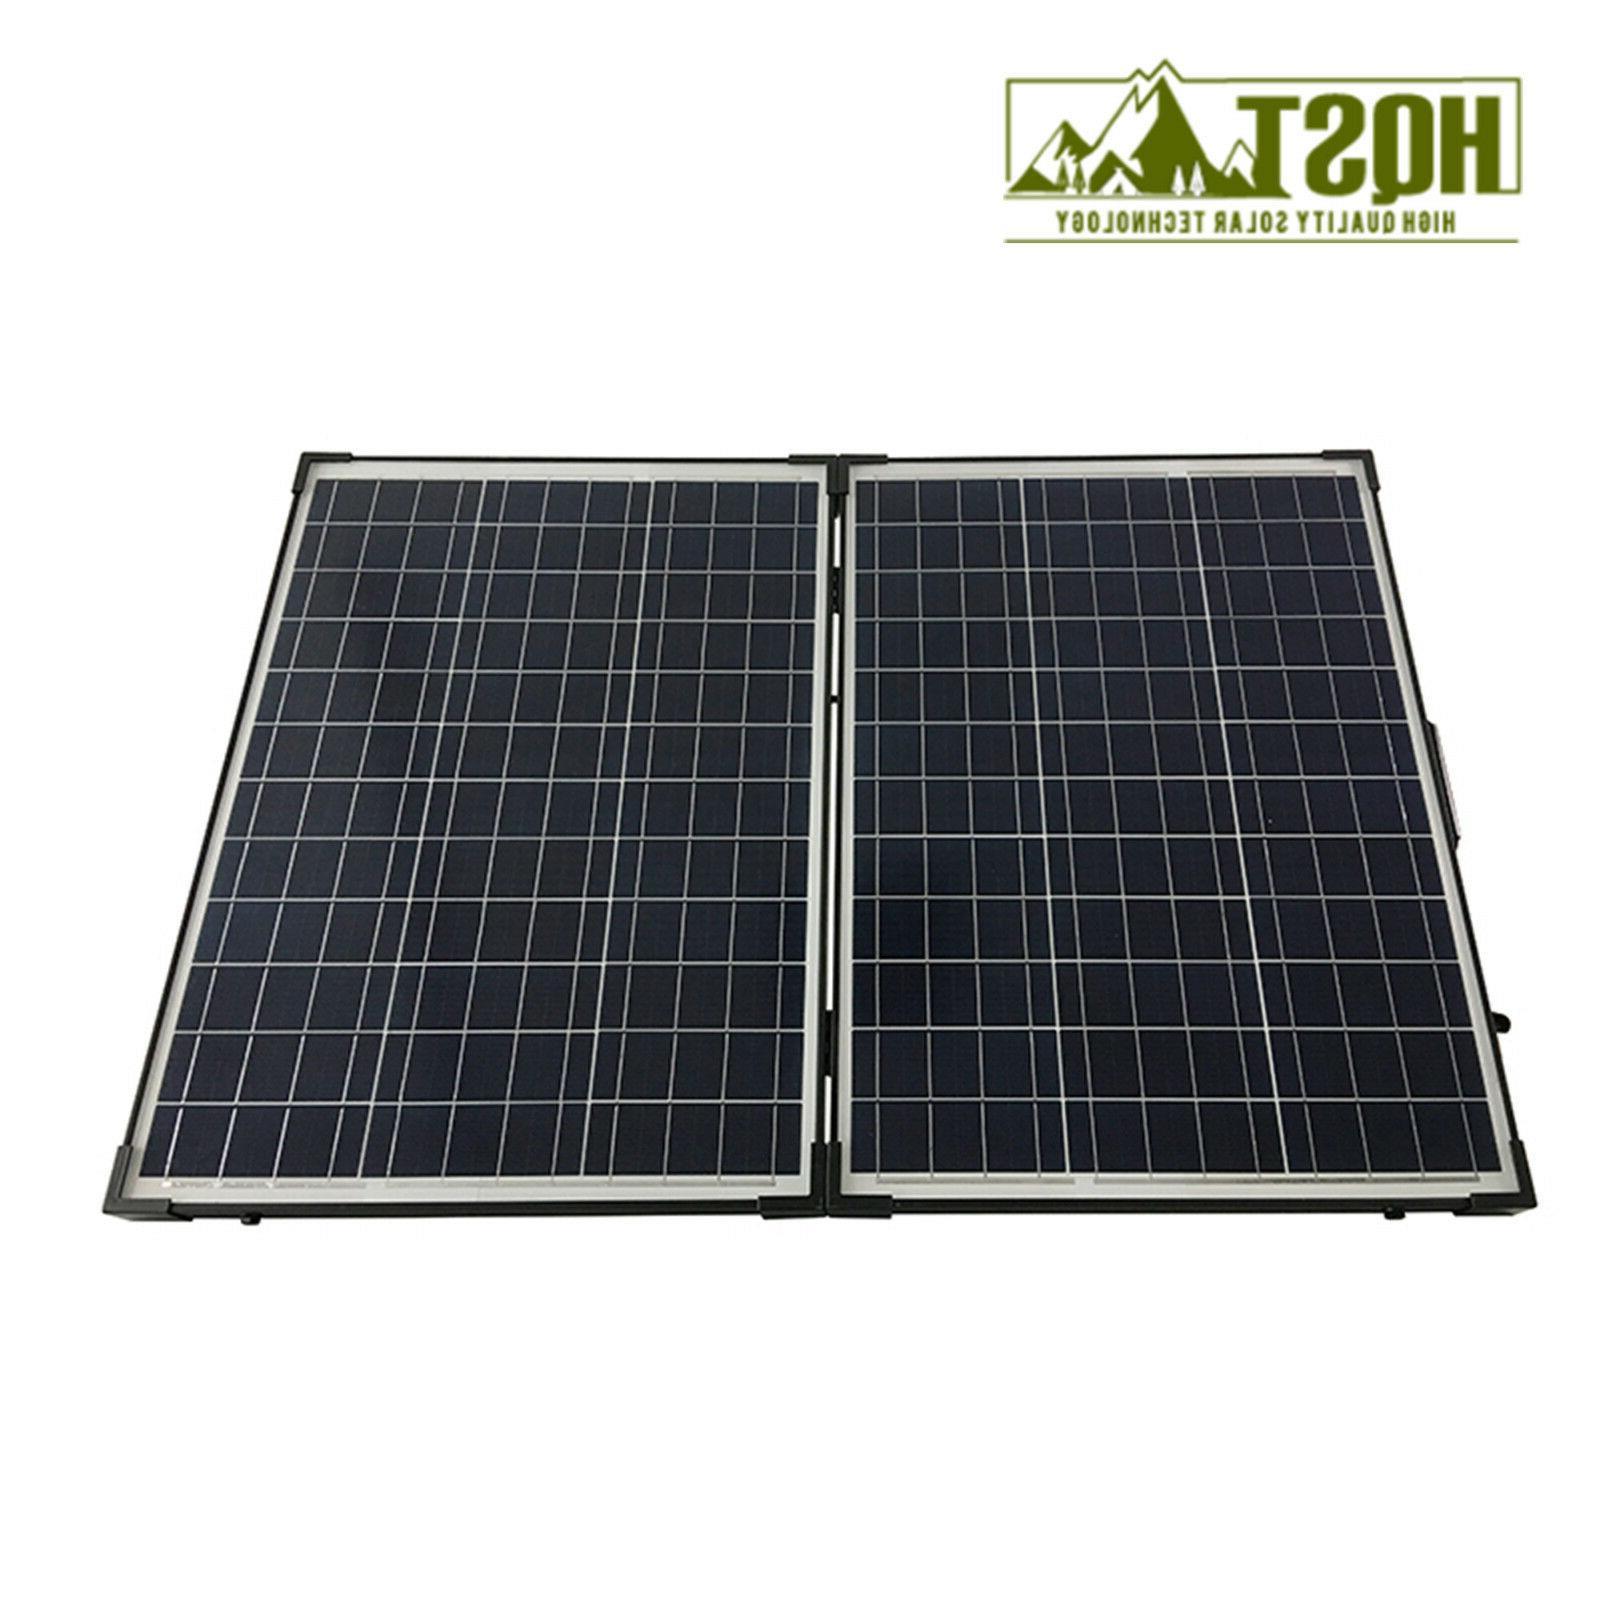 100W Polycrystalline Solar Suitcase w/ Portable